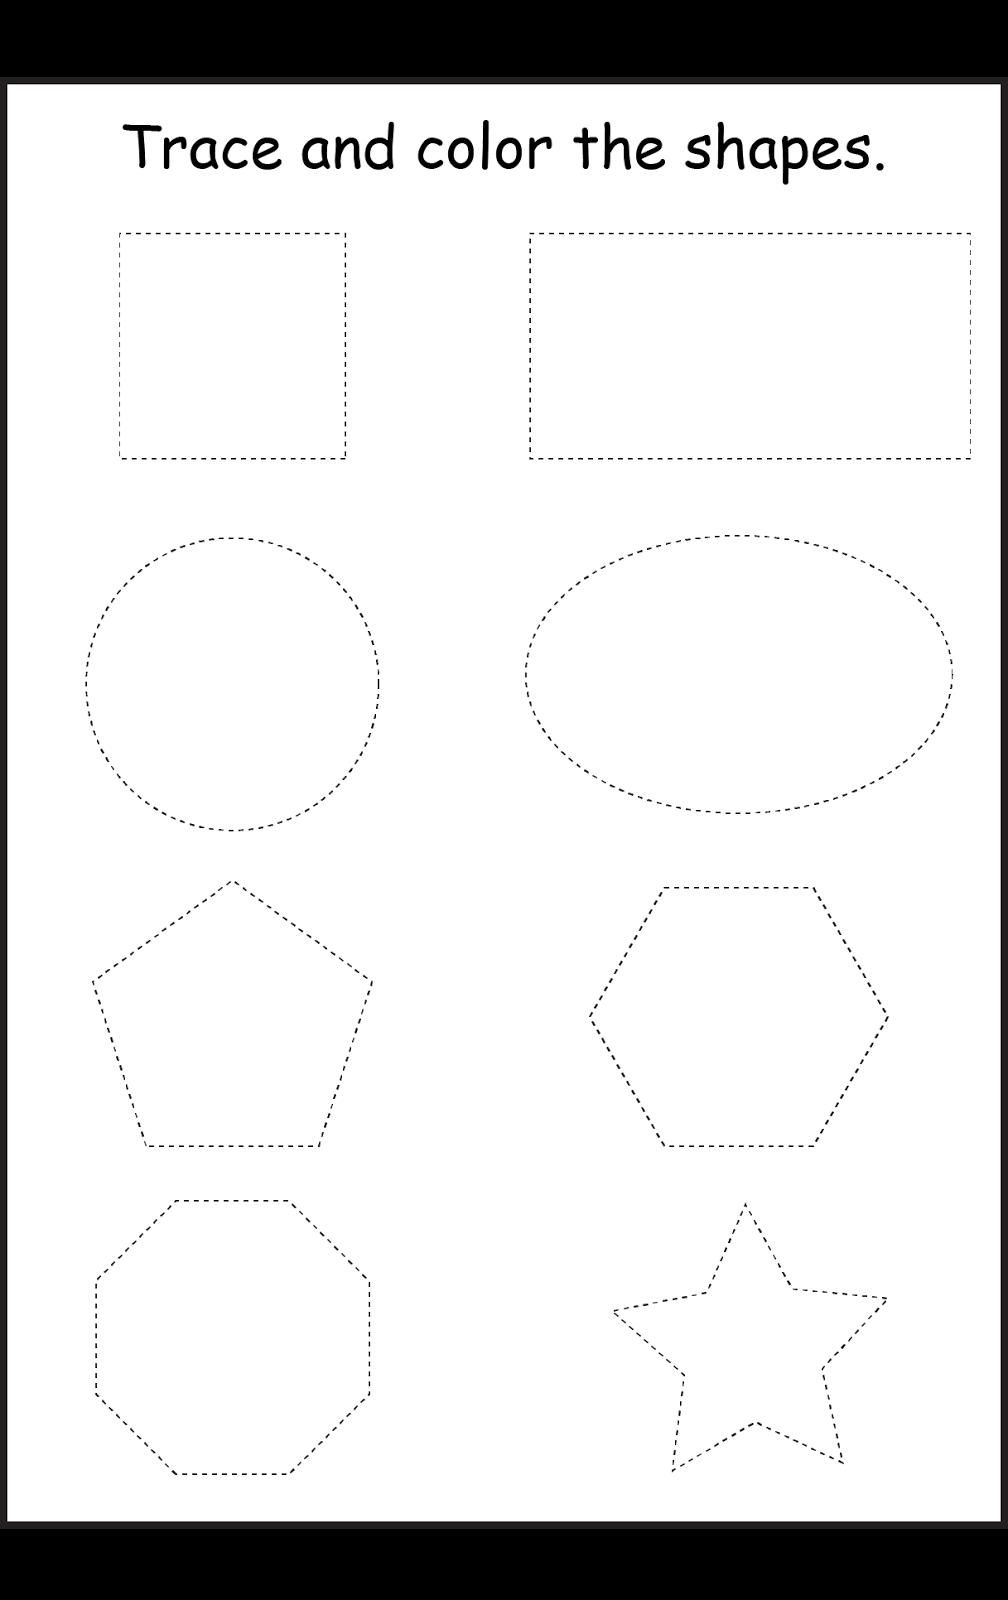 Shapes Worksheet Preschool Shape Worksheets For Preschool Shapes Preschool Preschool Worksheets [ 1600 x 1008 Pixel ]